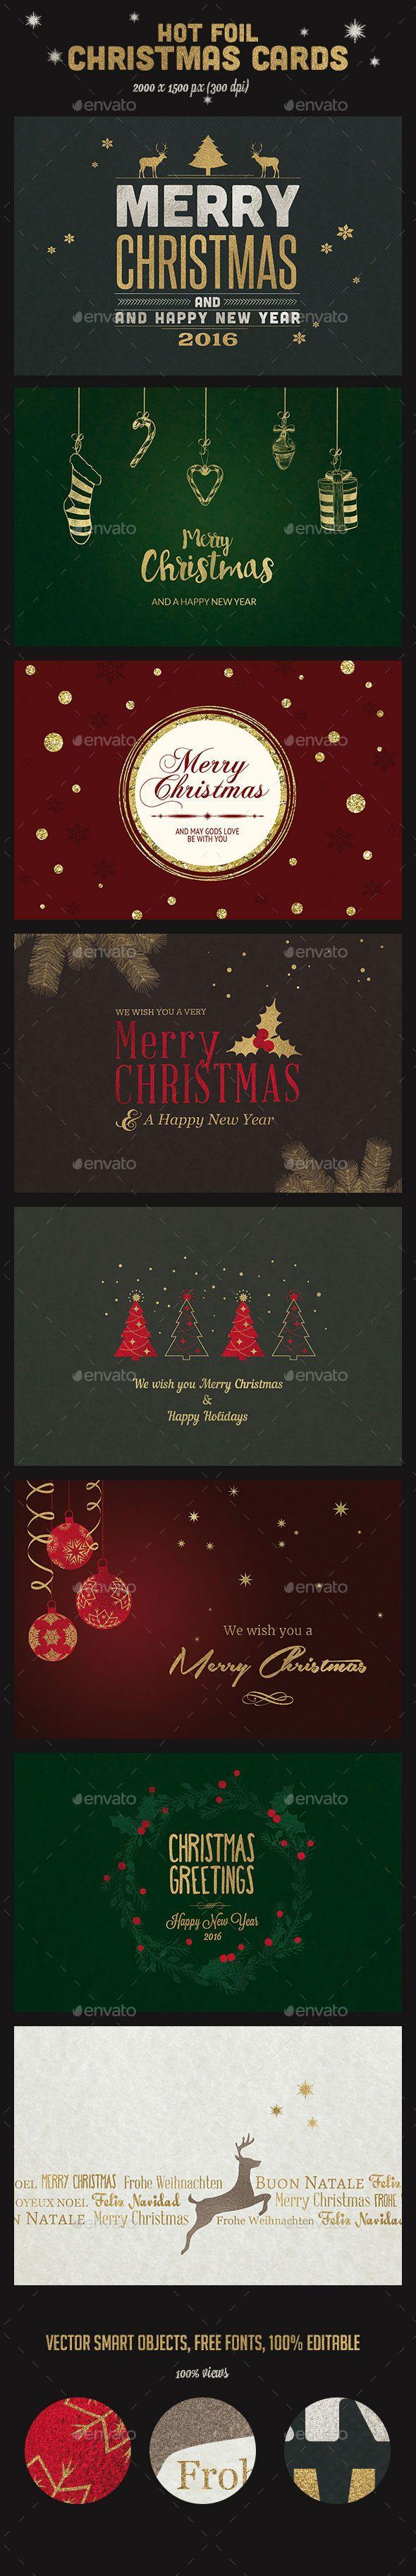 9 Hot Foil Christmas Cards Template PSD #design Download: http://graphicriver.net/item/9-hot-foil-christmas-cards-psd/13429476?ref=ksioks